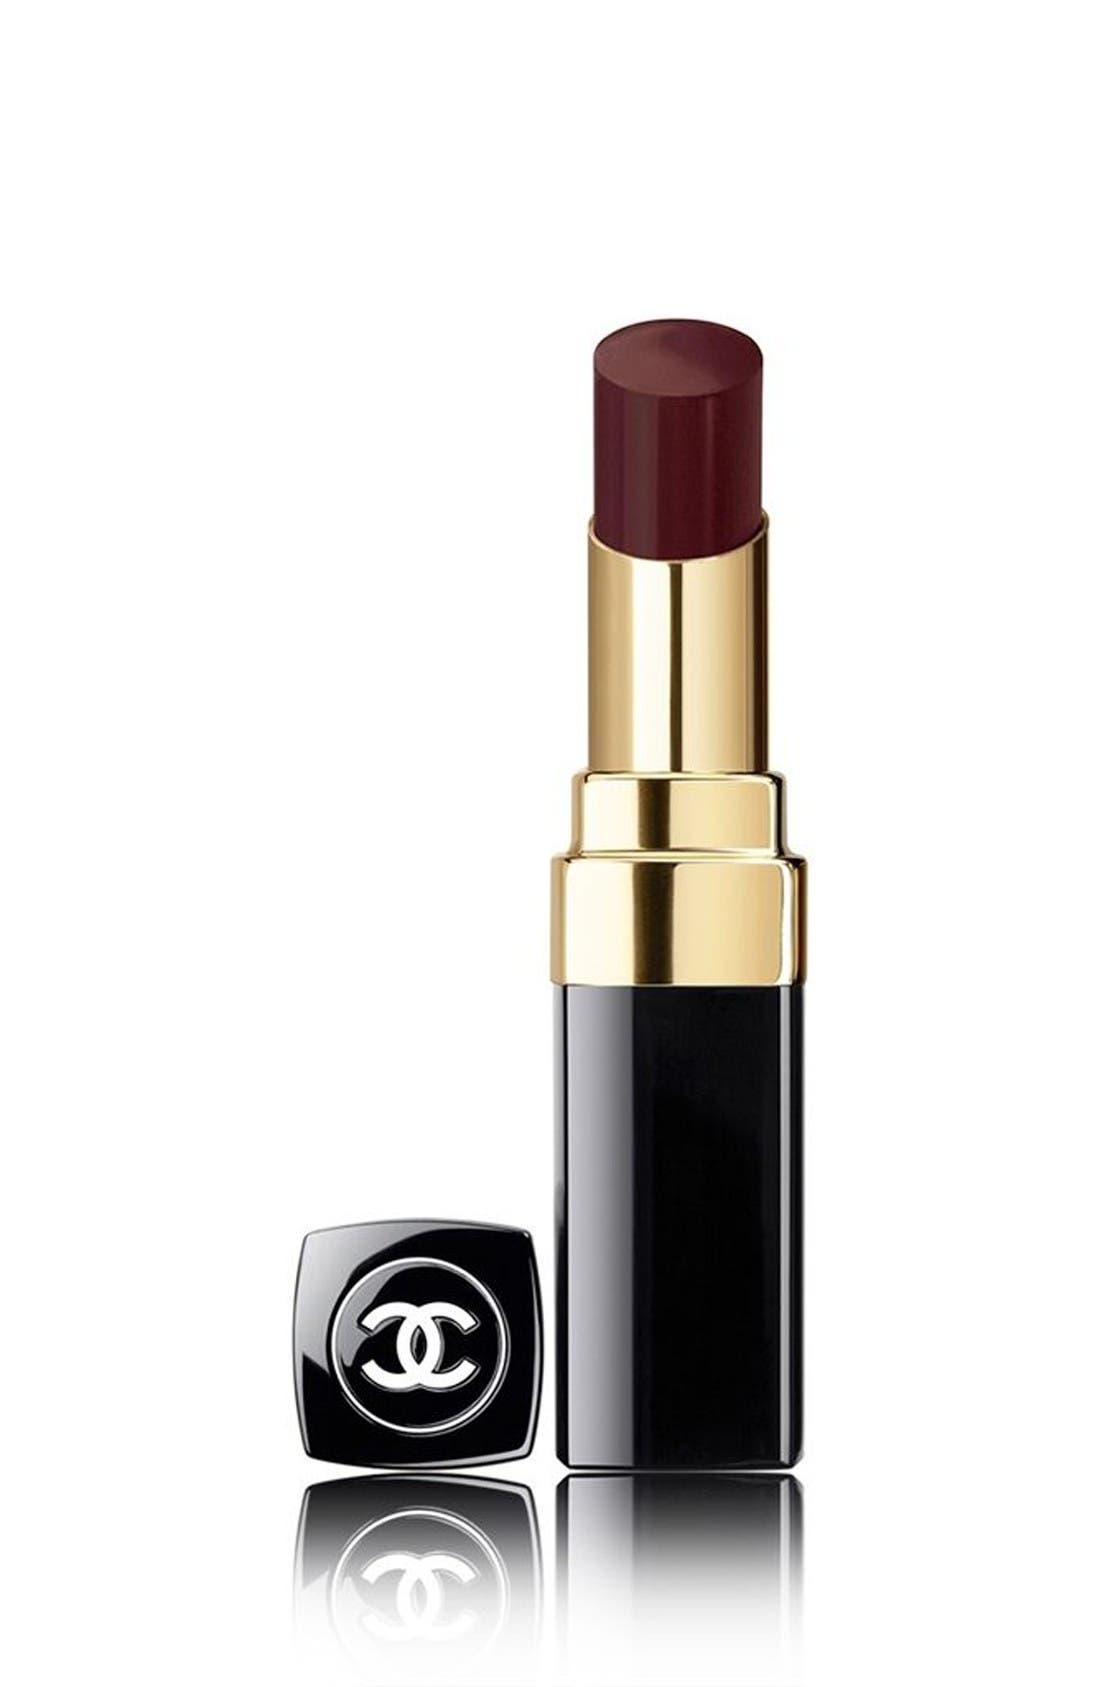 CHANEL ROUGE COCO SHINE  Hydrating Sheer Lipshine